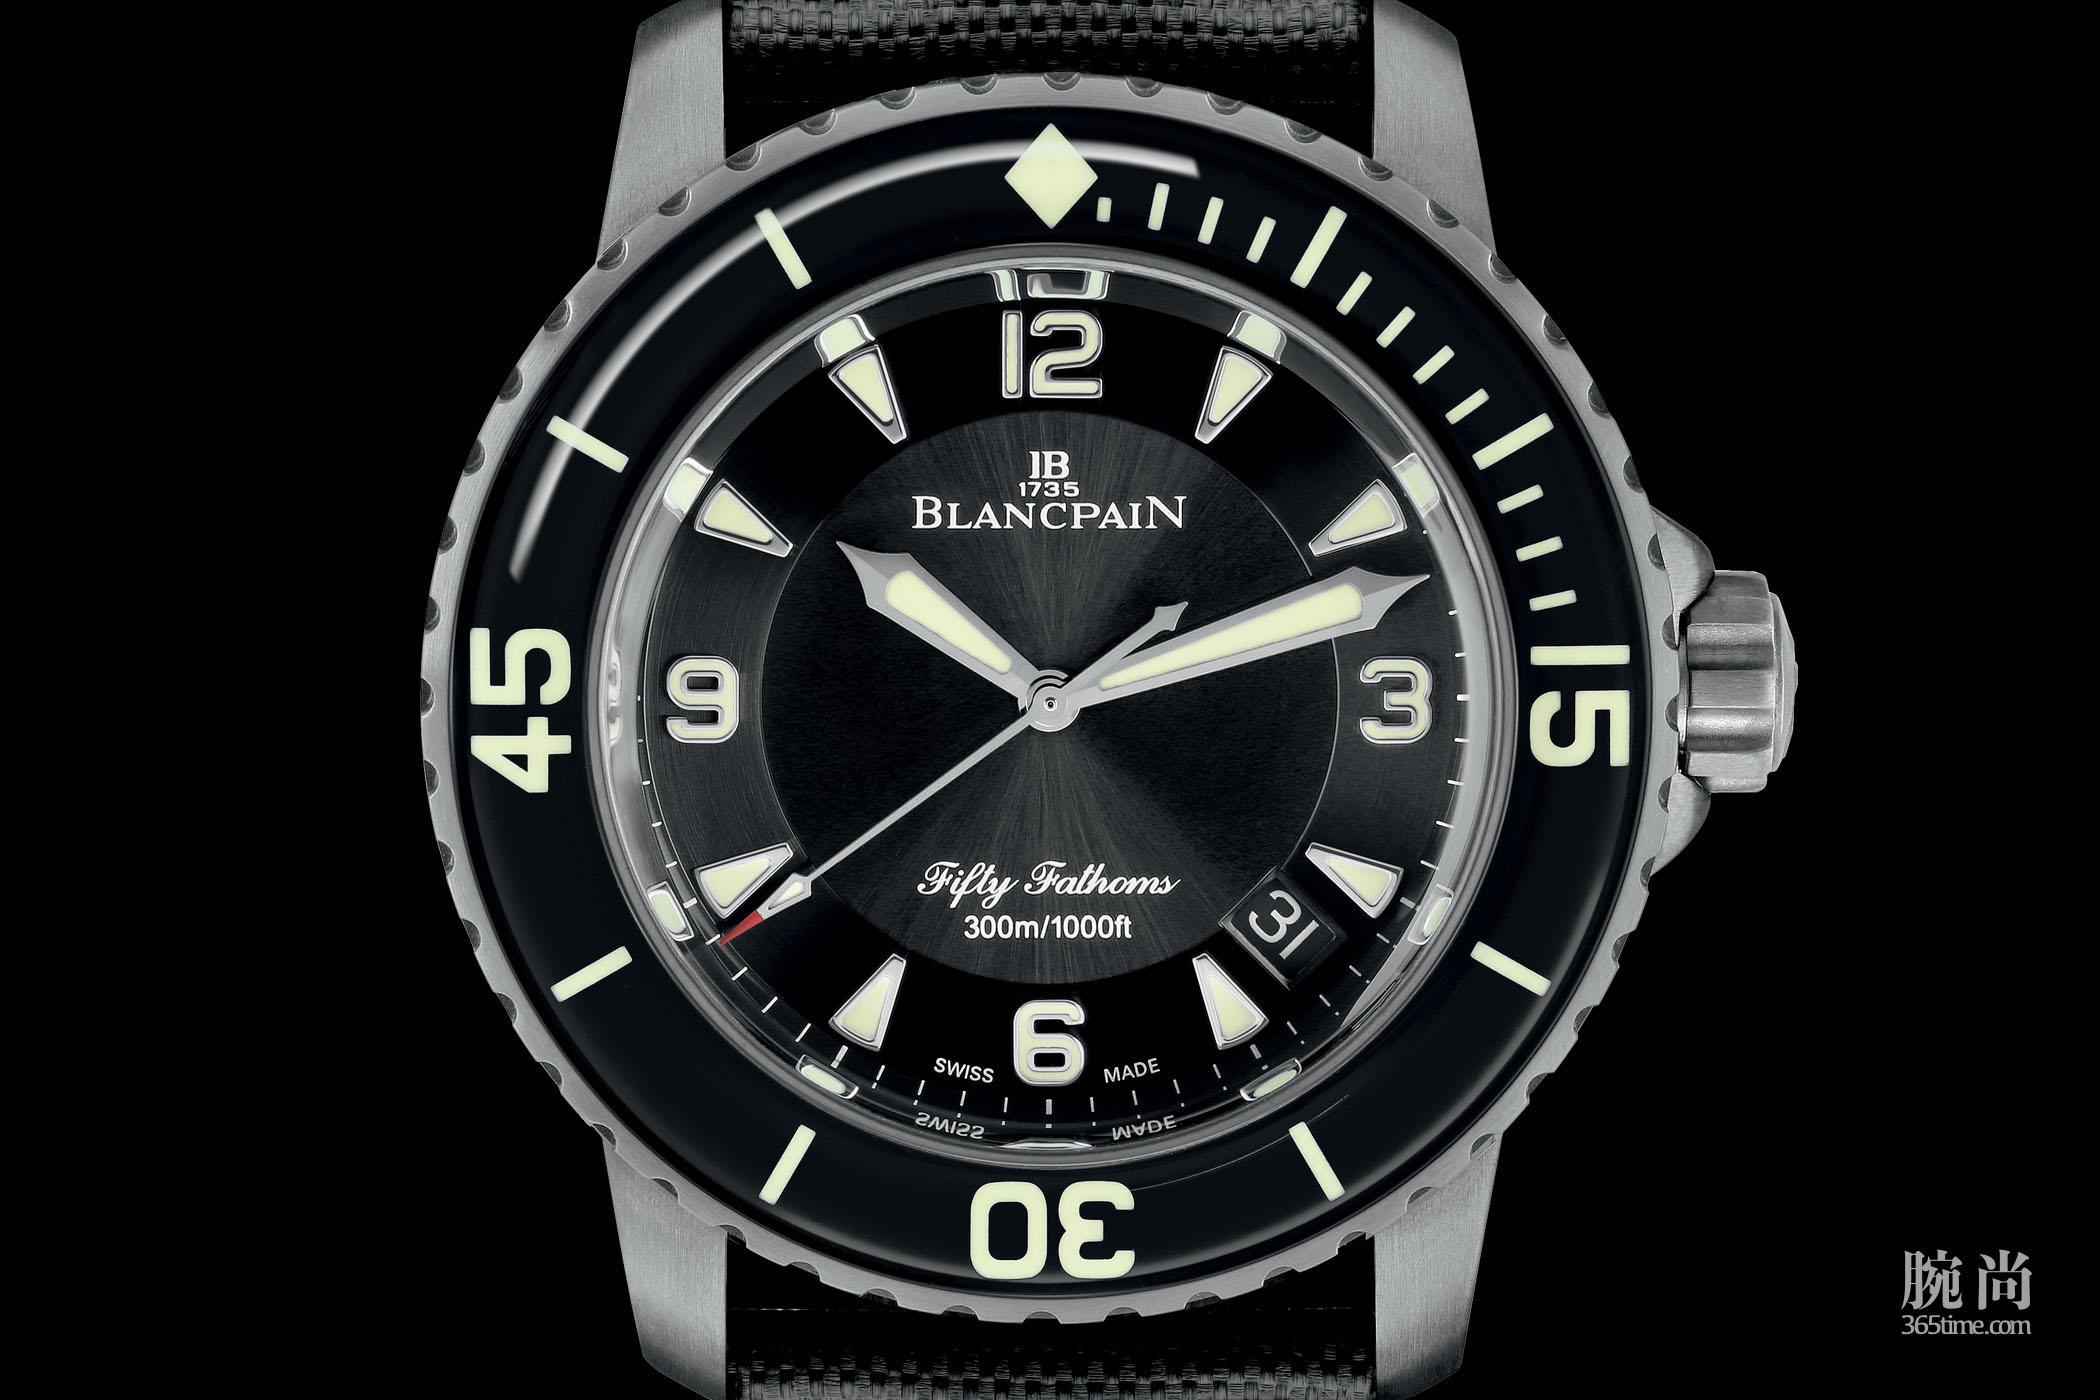 Blancpain-Fifty-Fathoms-Automatique-5015-Titanium-4.jpg